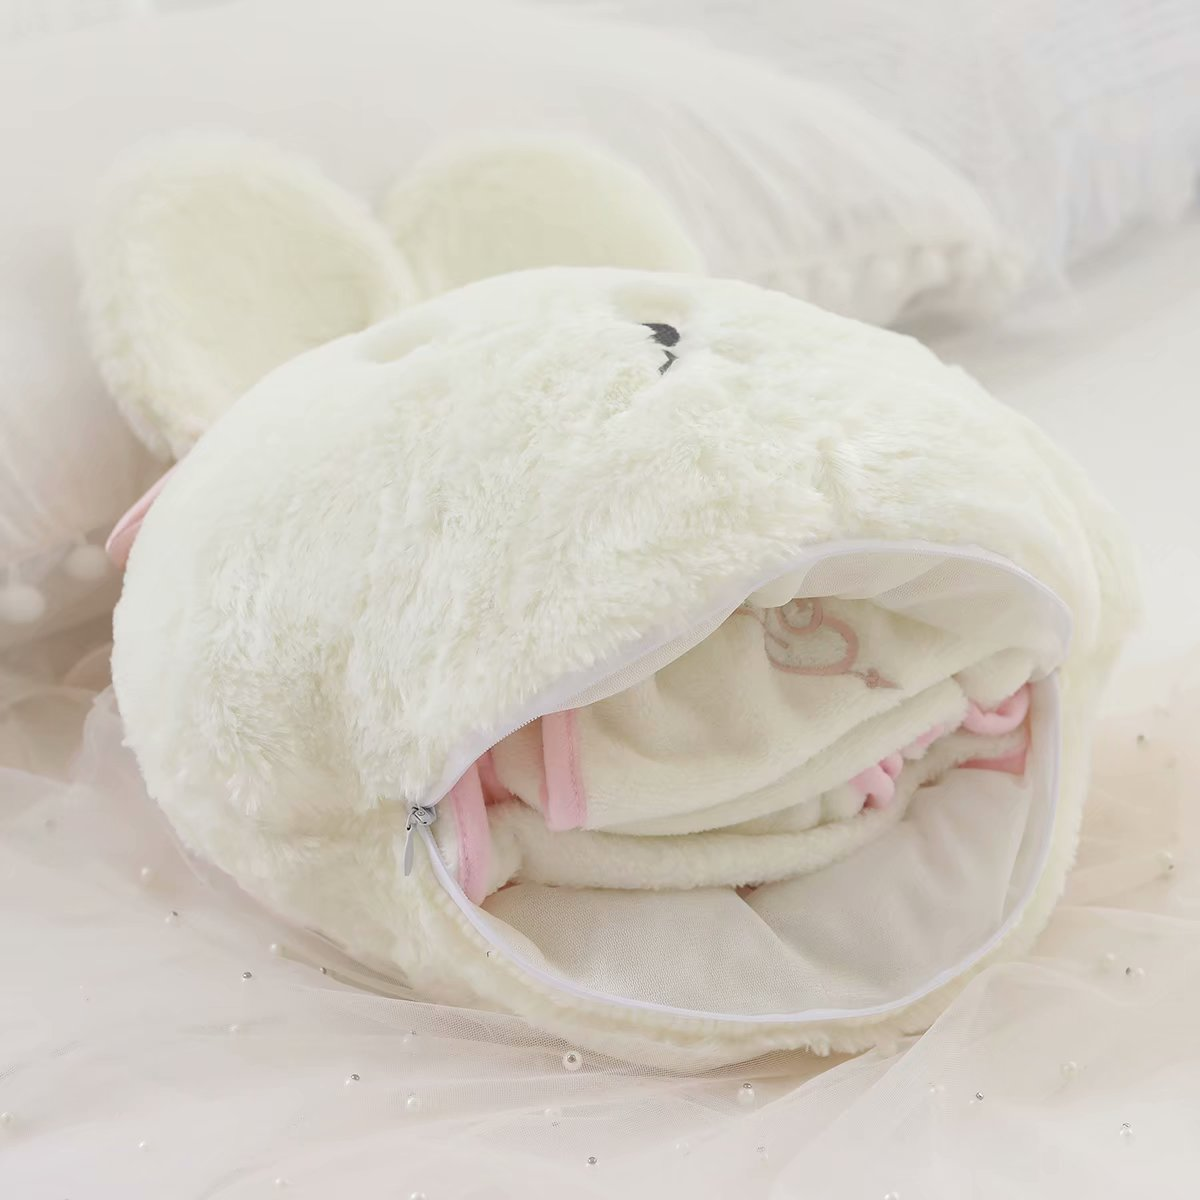 almofada de pelúcia macia para a menina presente de aniversário